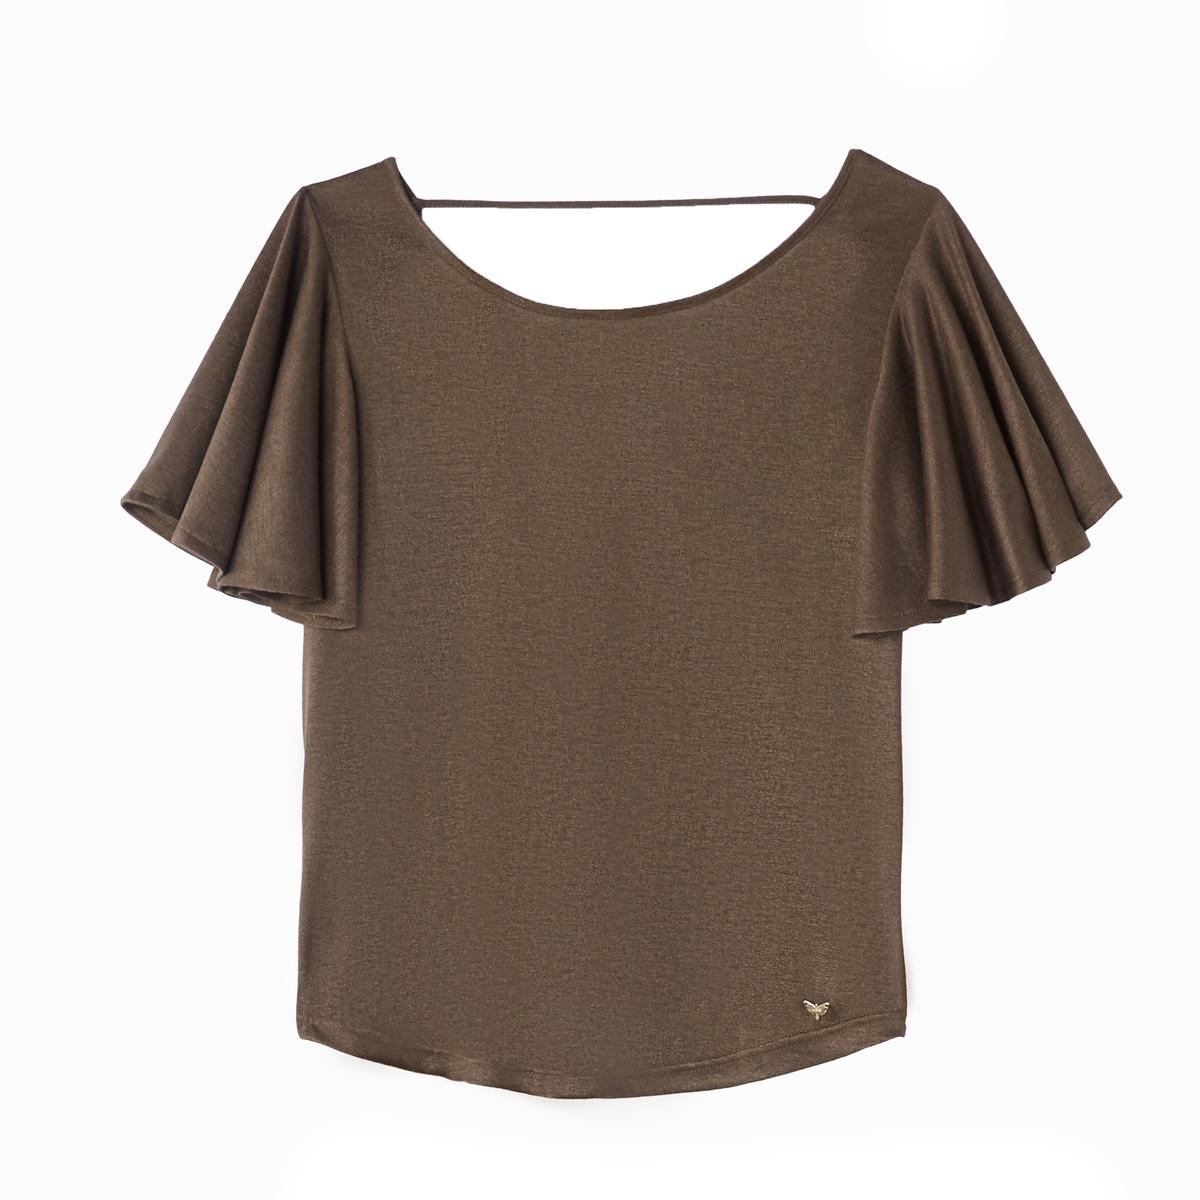 T-shirt de gola redonda, mangas curtas evasés